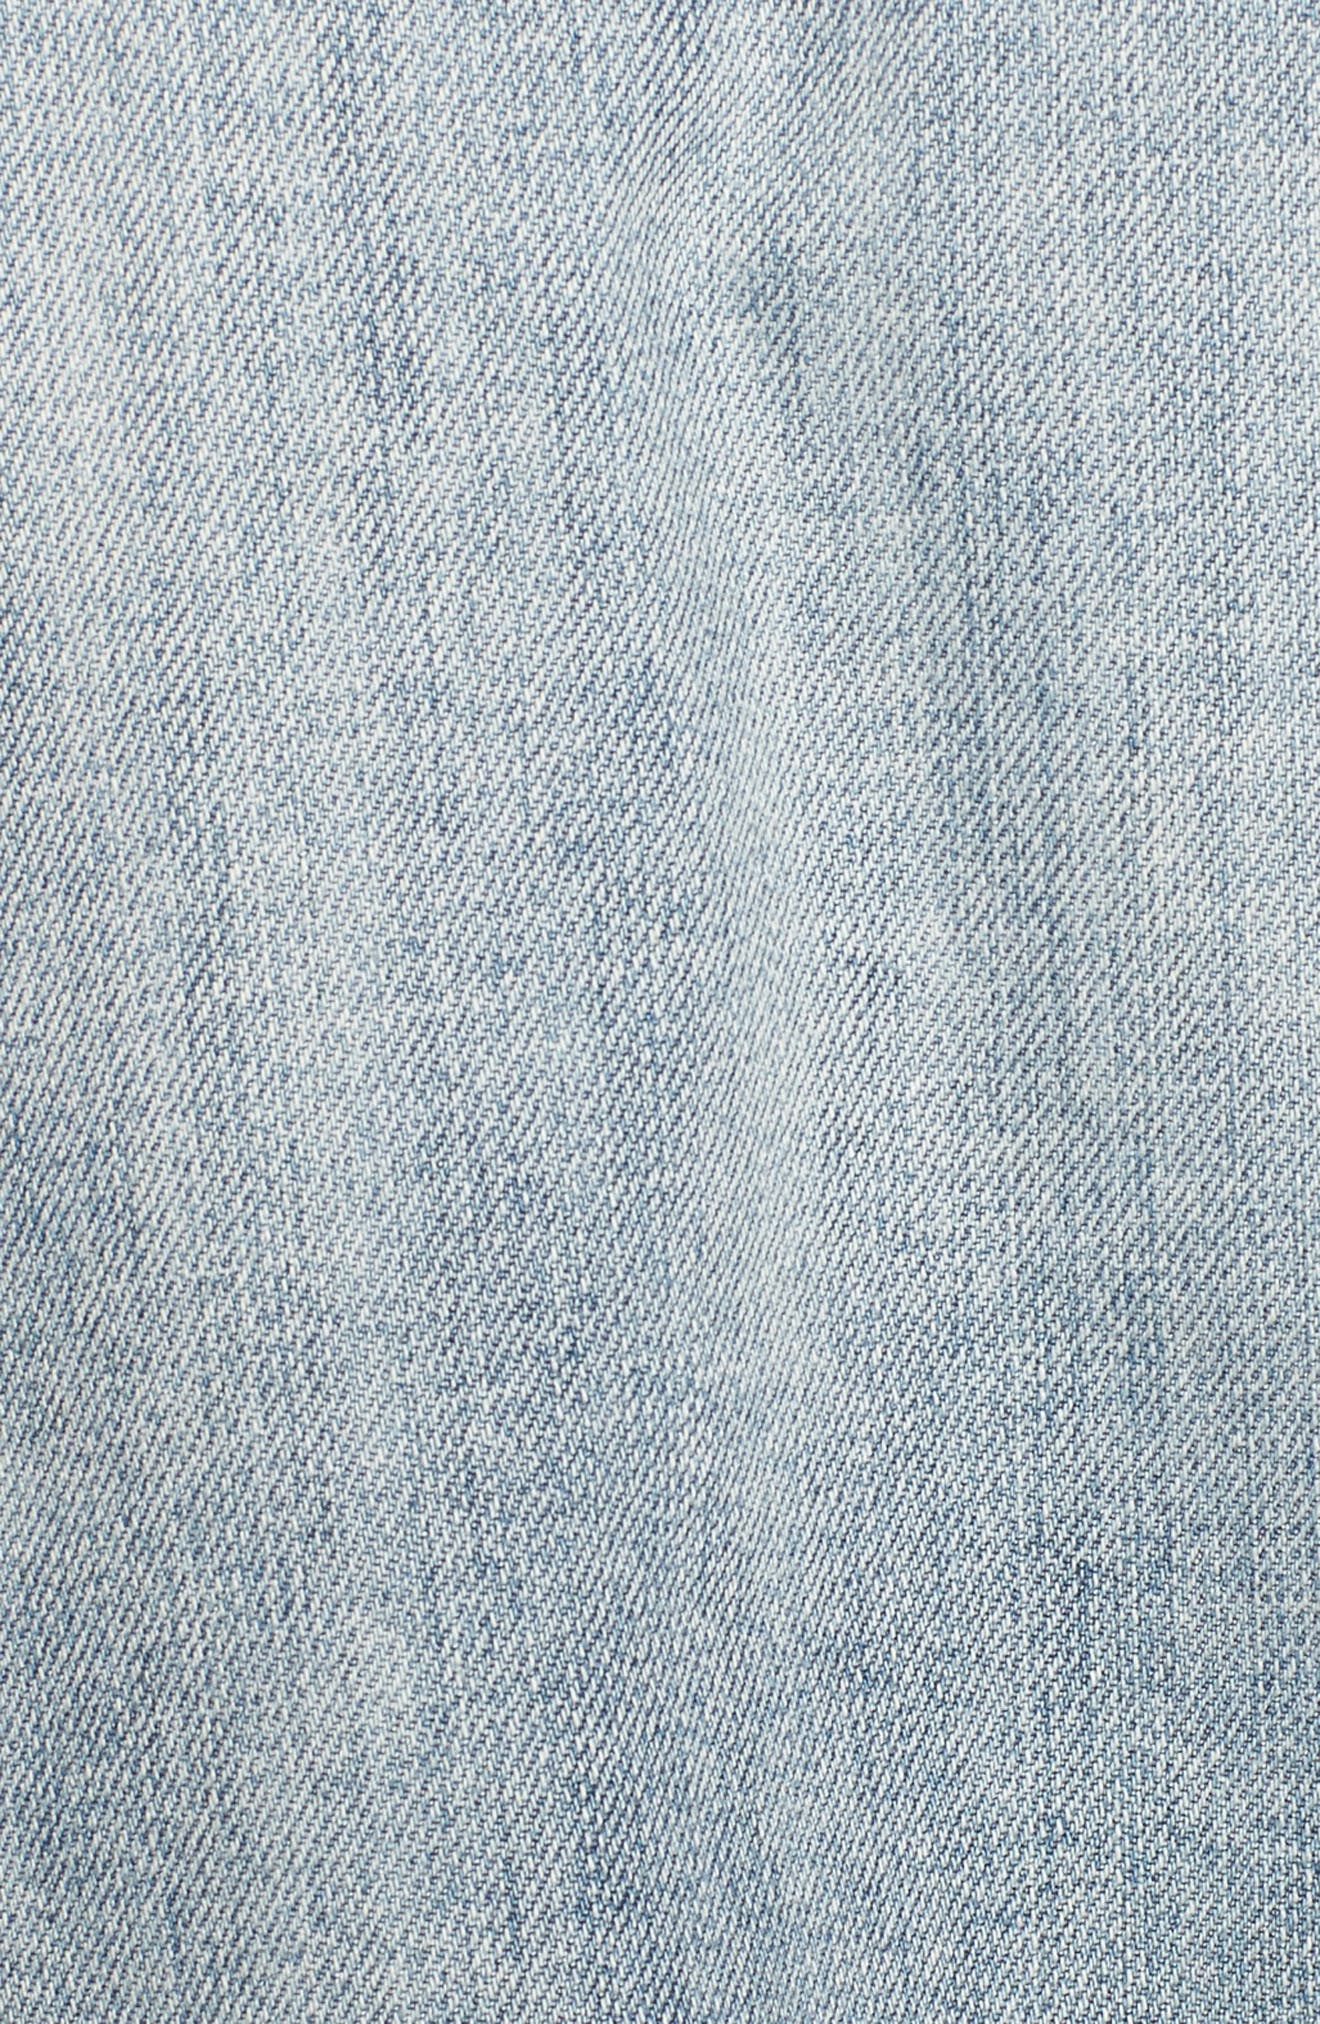 Knox Studded Denim Jacket,                             Alternate thumbnail 6, color,